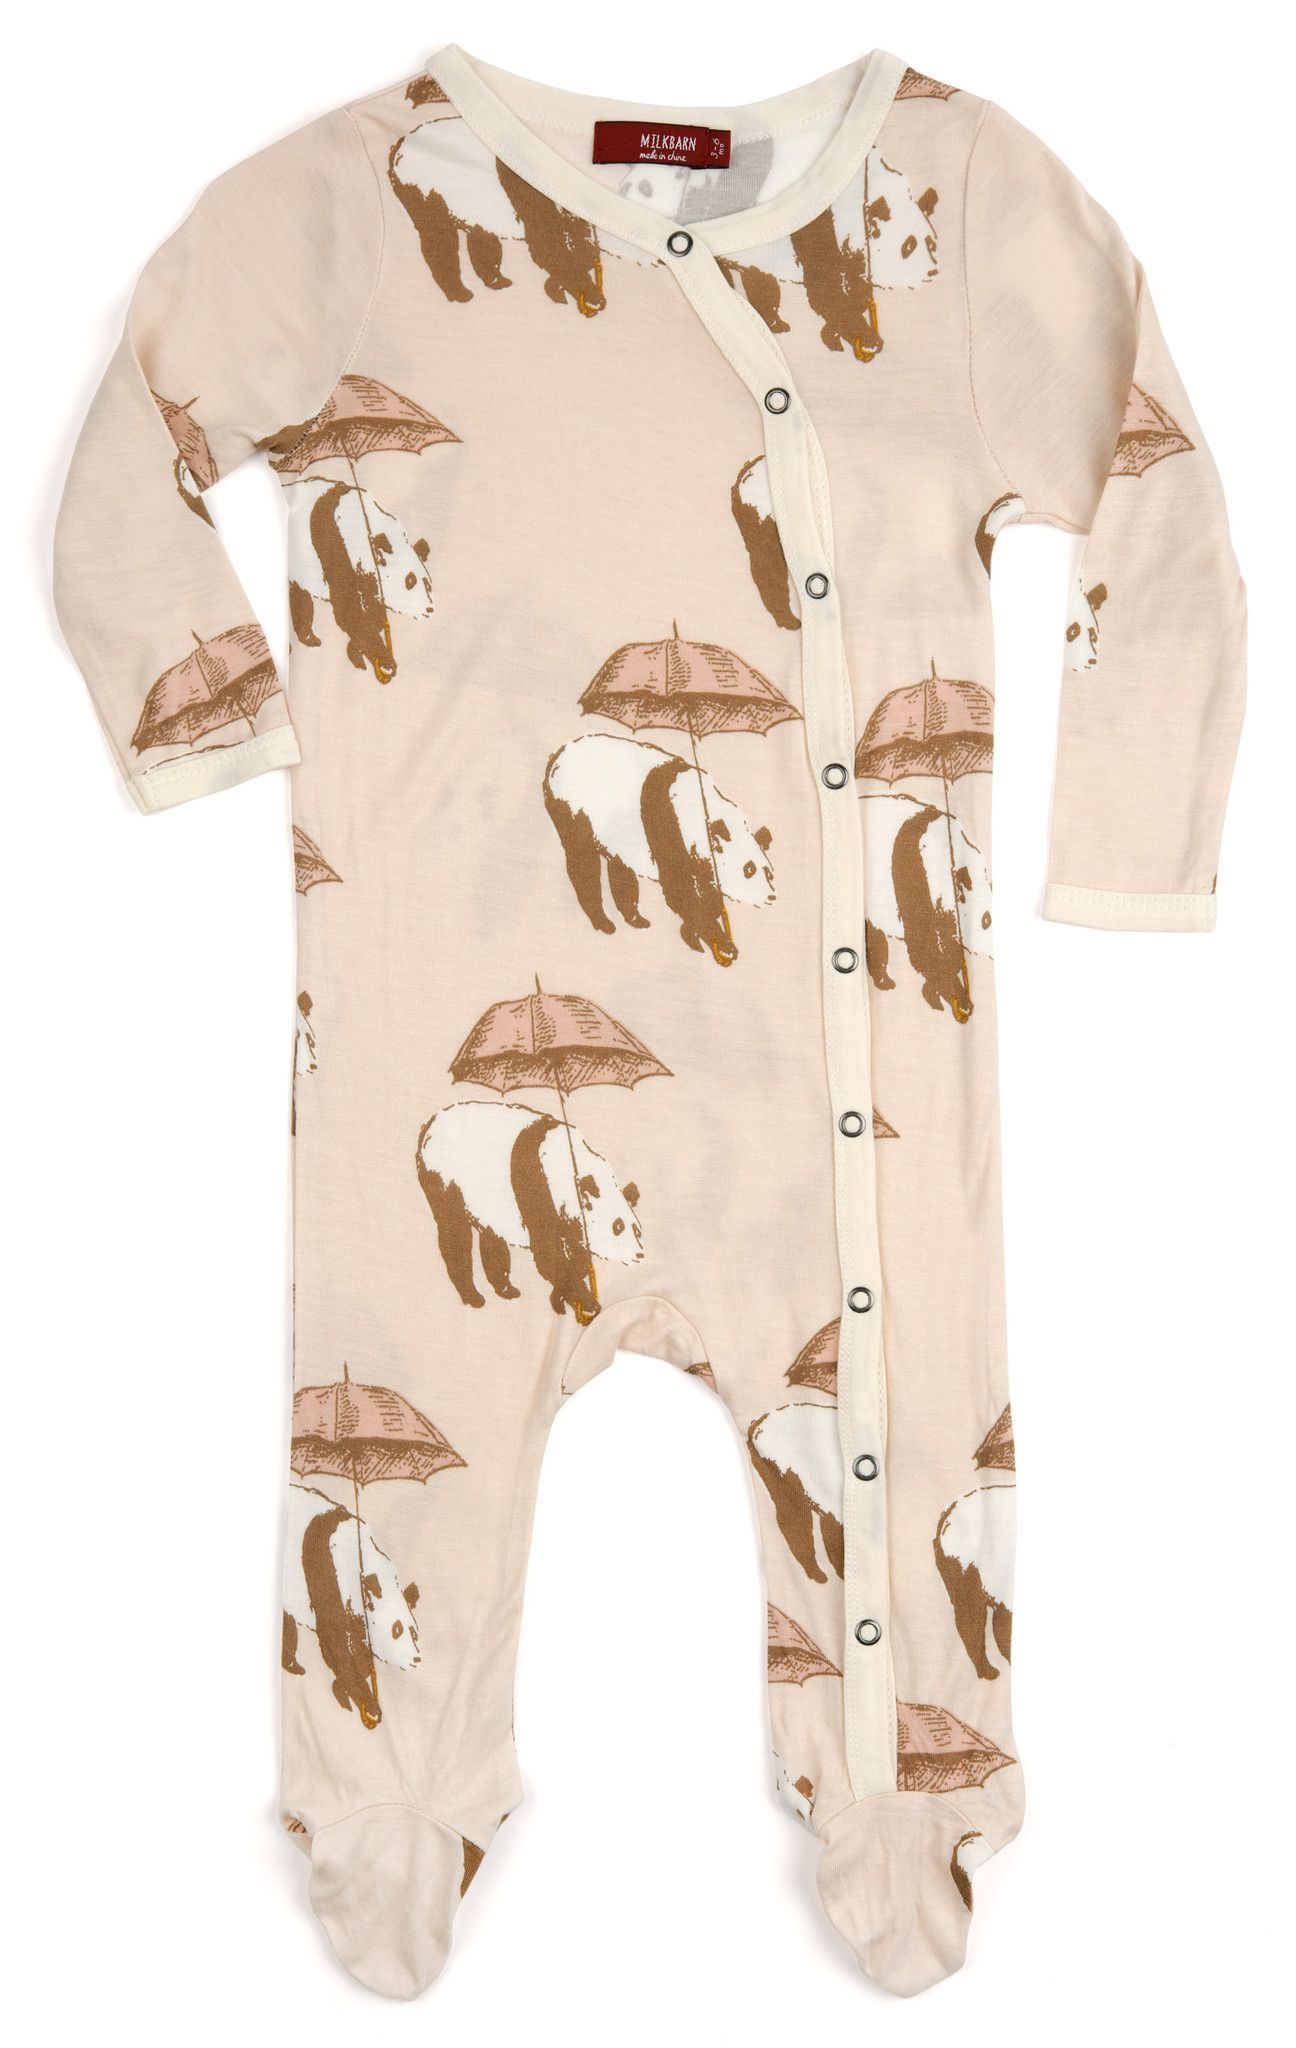 MilkBarn Baby Bamboo Footed Romper Pink Umbrella Panda